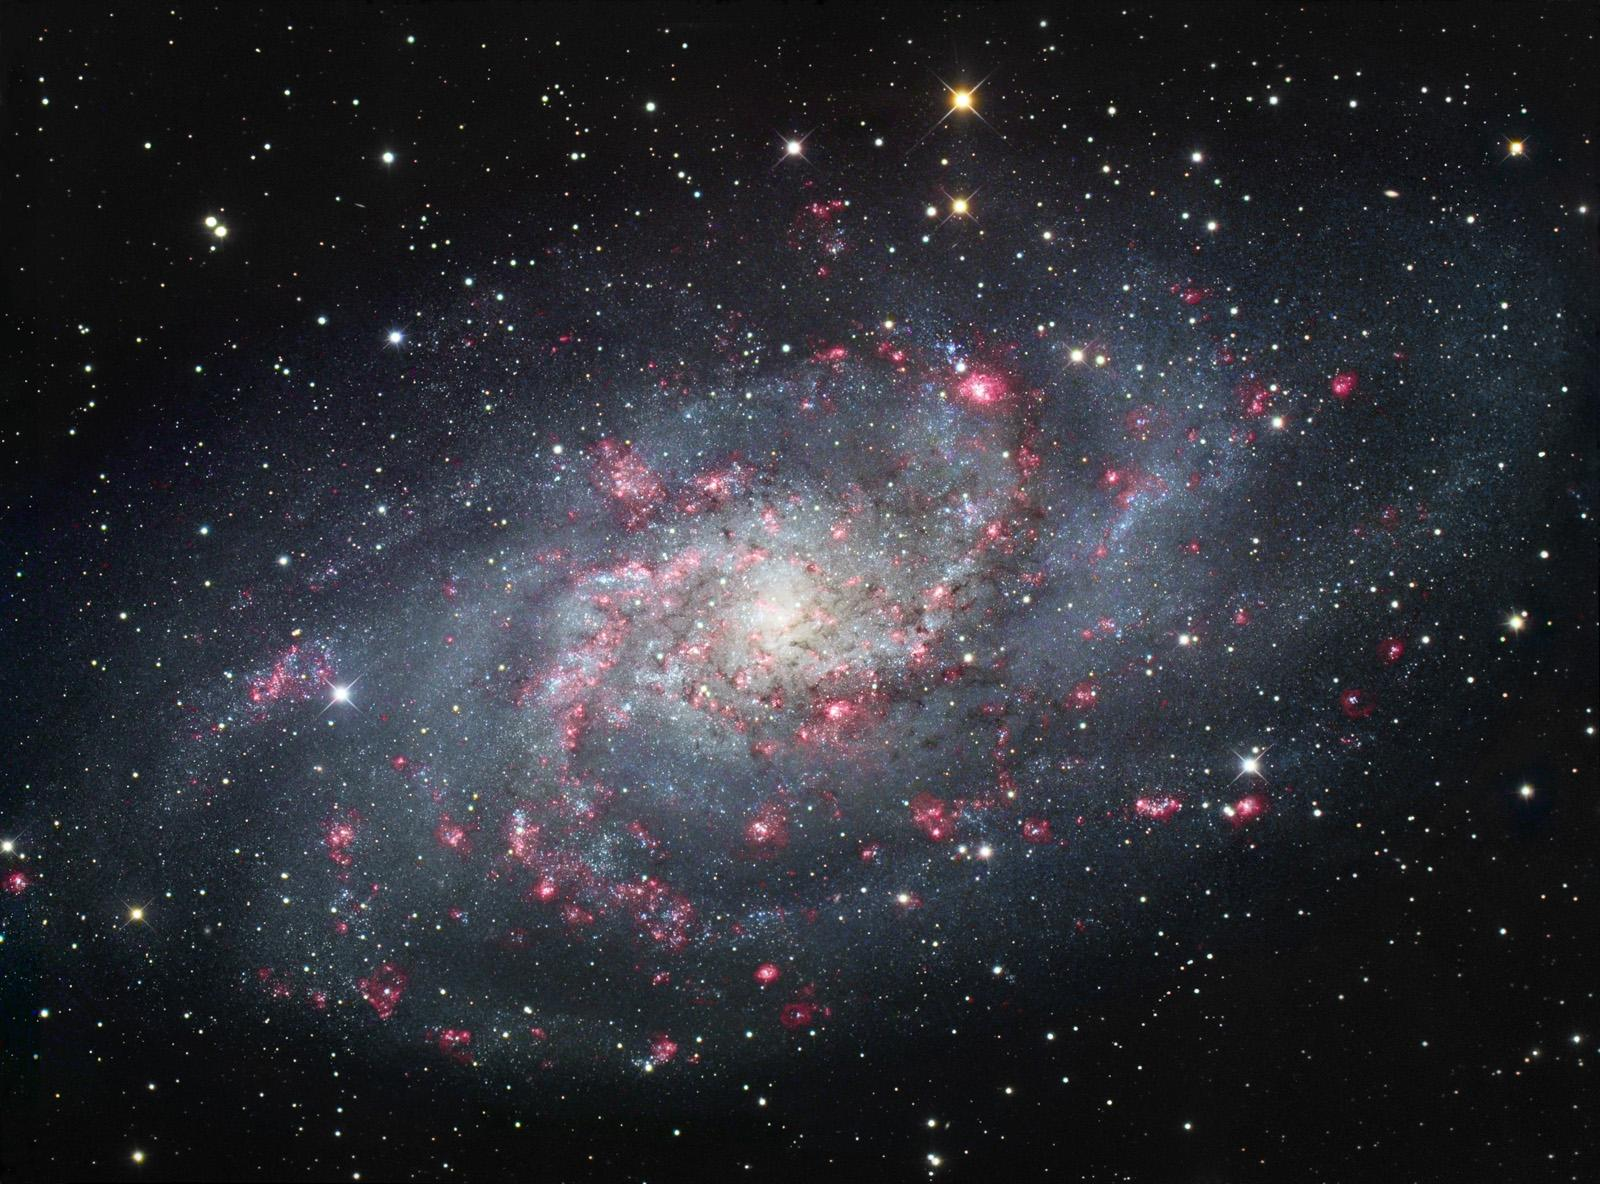 Robert Gendler – Nebulosas y galaxias - Paperblog